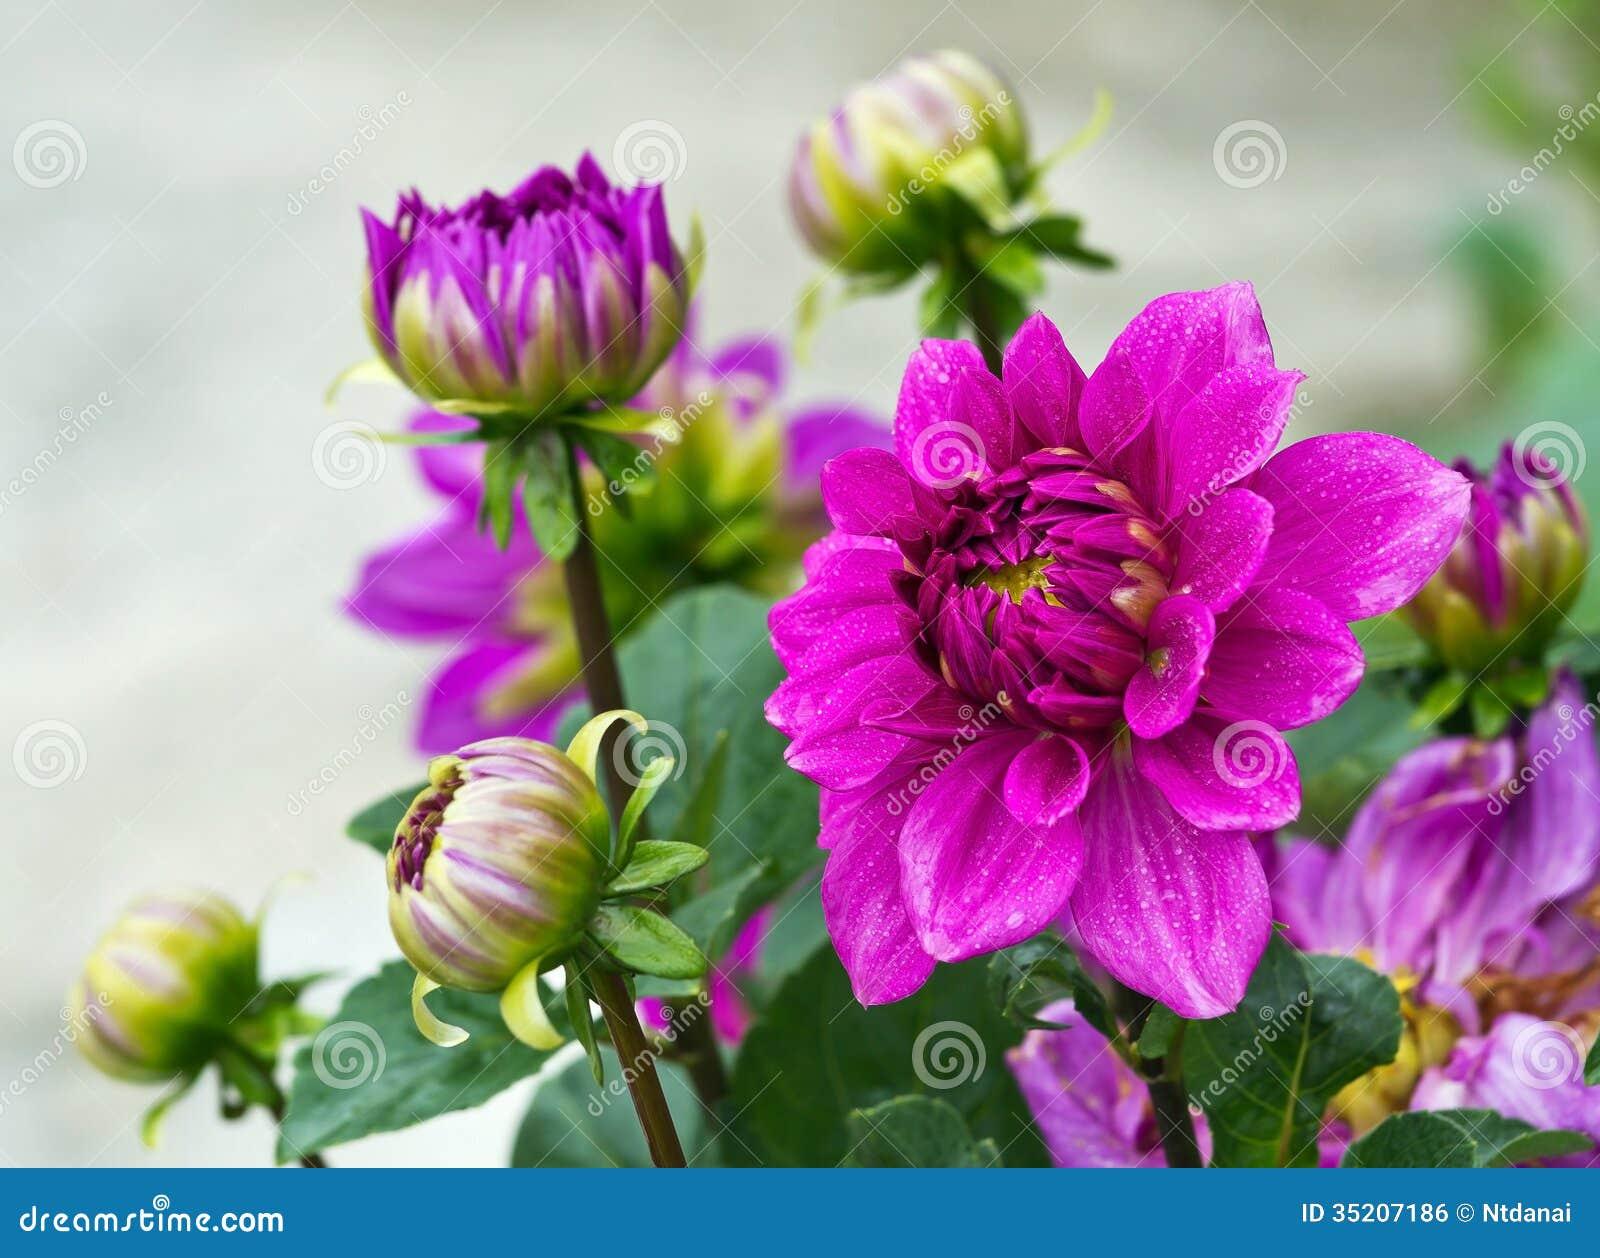 Violet Garden Dahlia Stock Photo Image Of Flora Bright 35207186